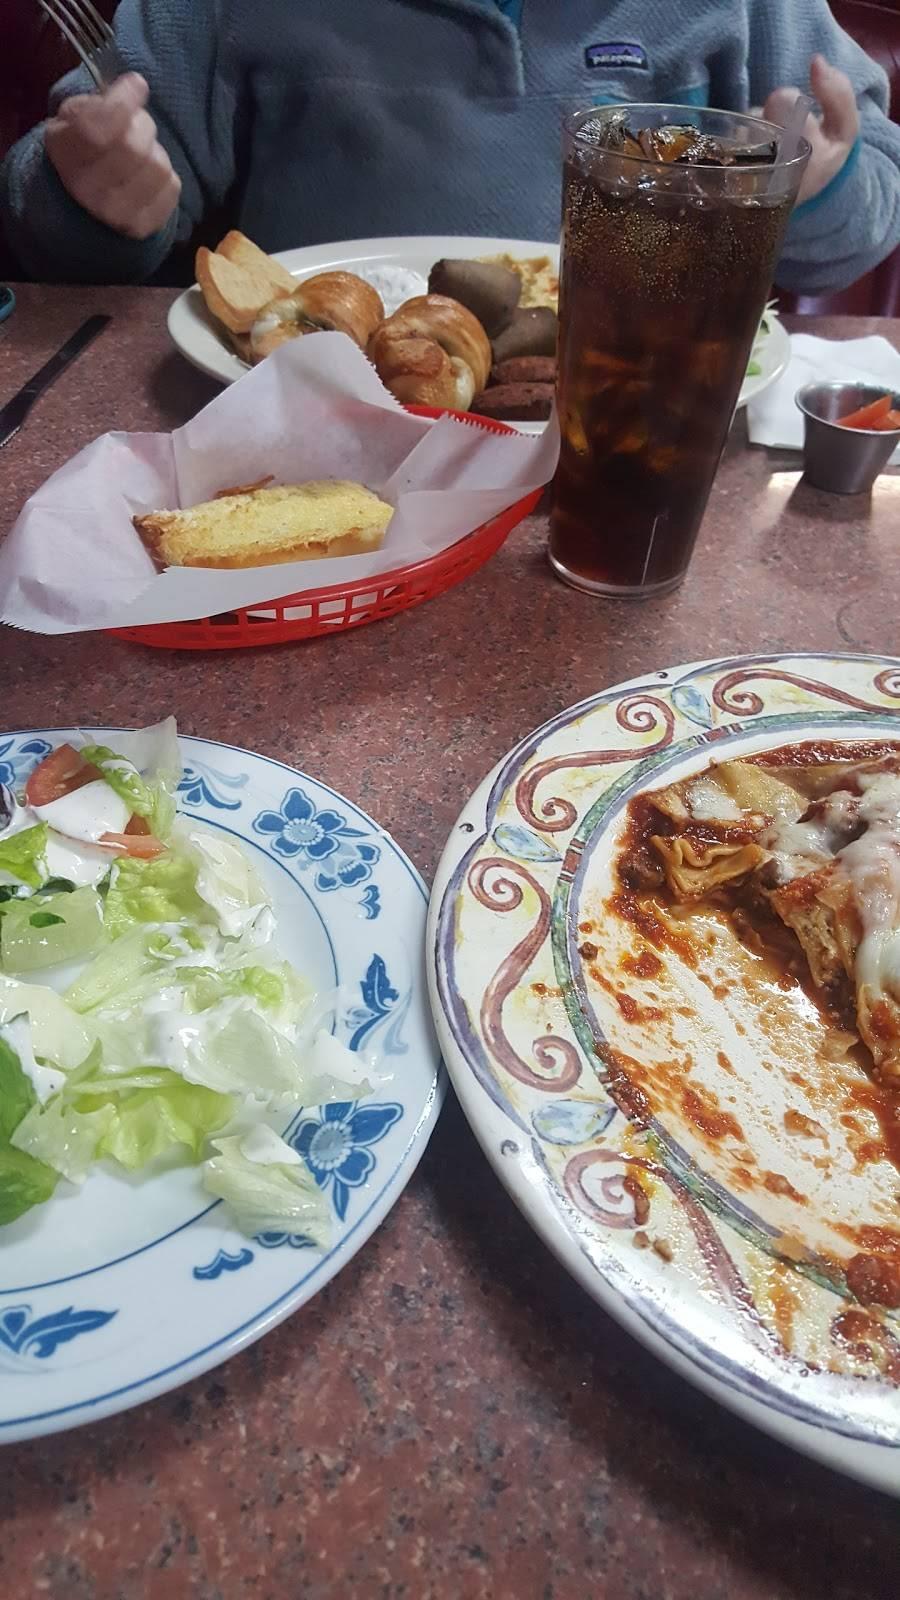 Primo Pizza | restaurant | 1010 Piney Forest Rd, Danville, VA 24540, USA | 4347913001 OR +1 434-791-3001